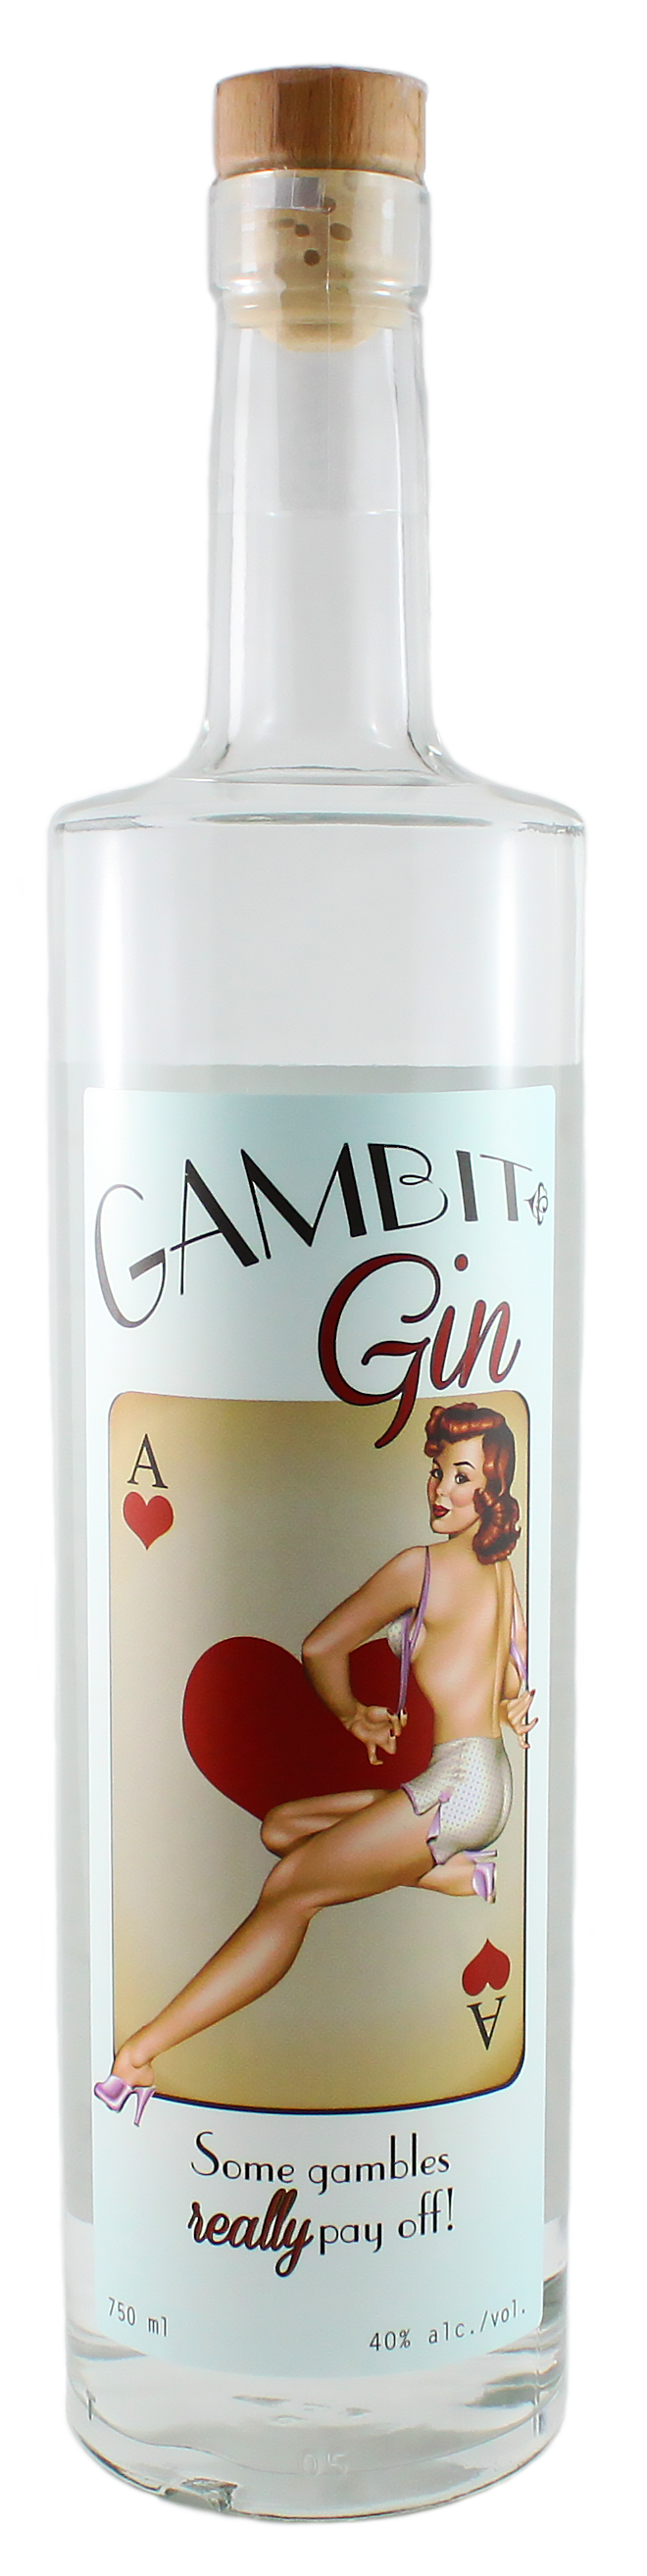 Lucky Bastard Distillers Gambit Gin